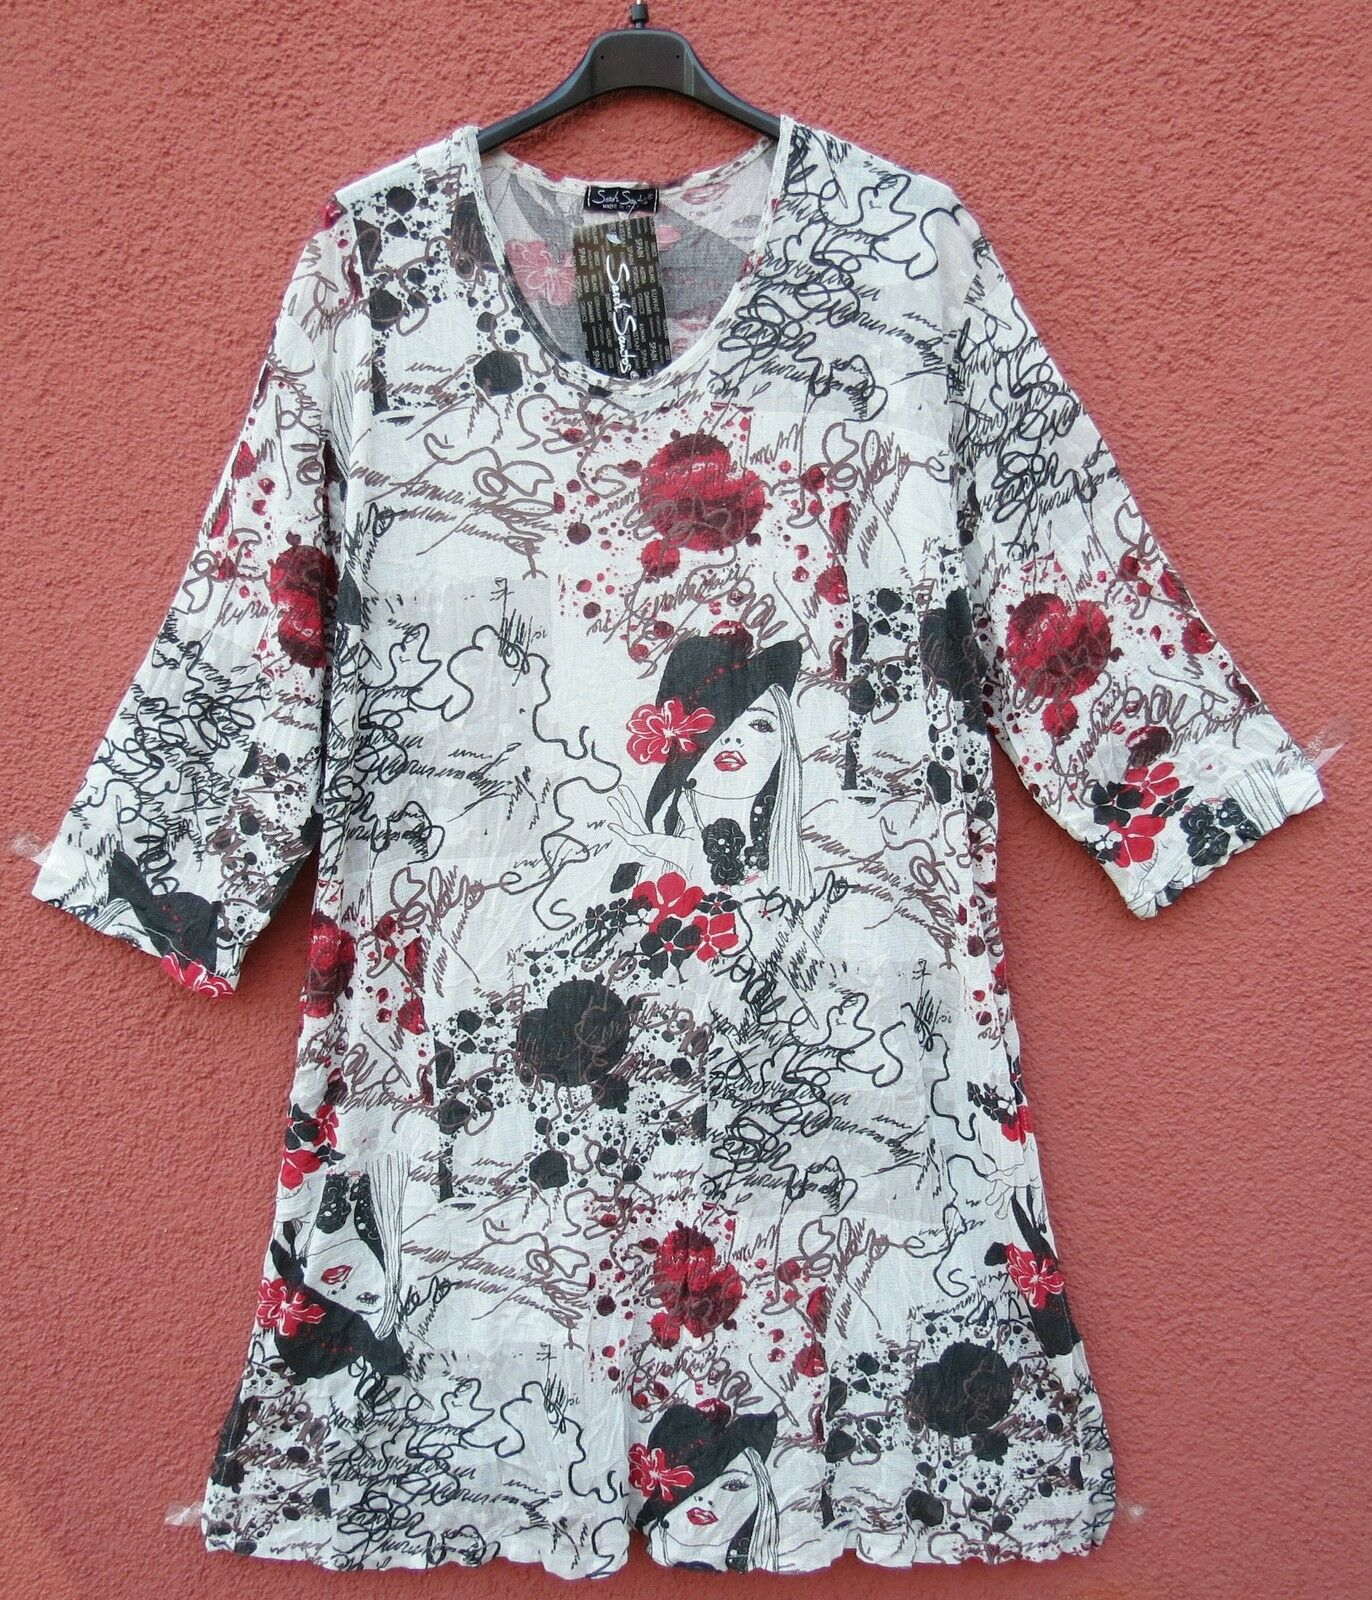 NEU SARAH SANTOS Tunika Shirt Tunic Tunique Tunica XXL 52 54 Lagenlook